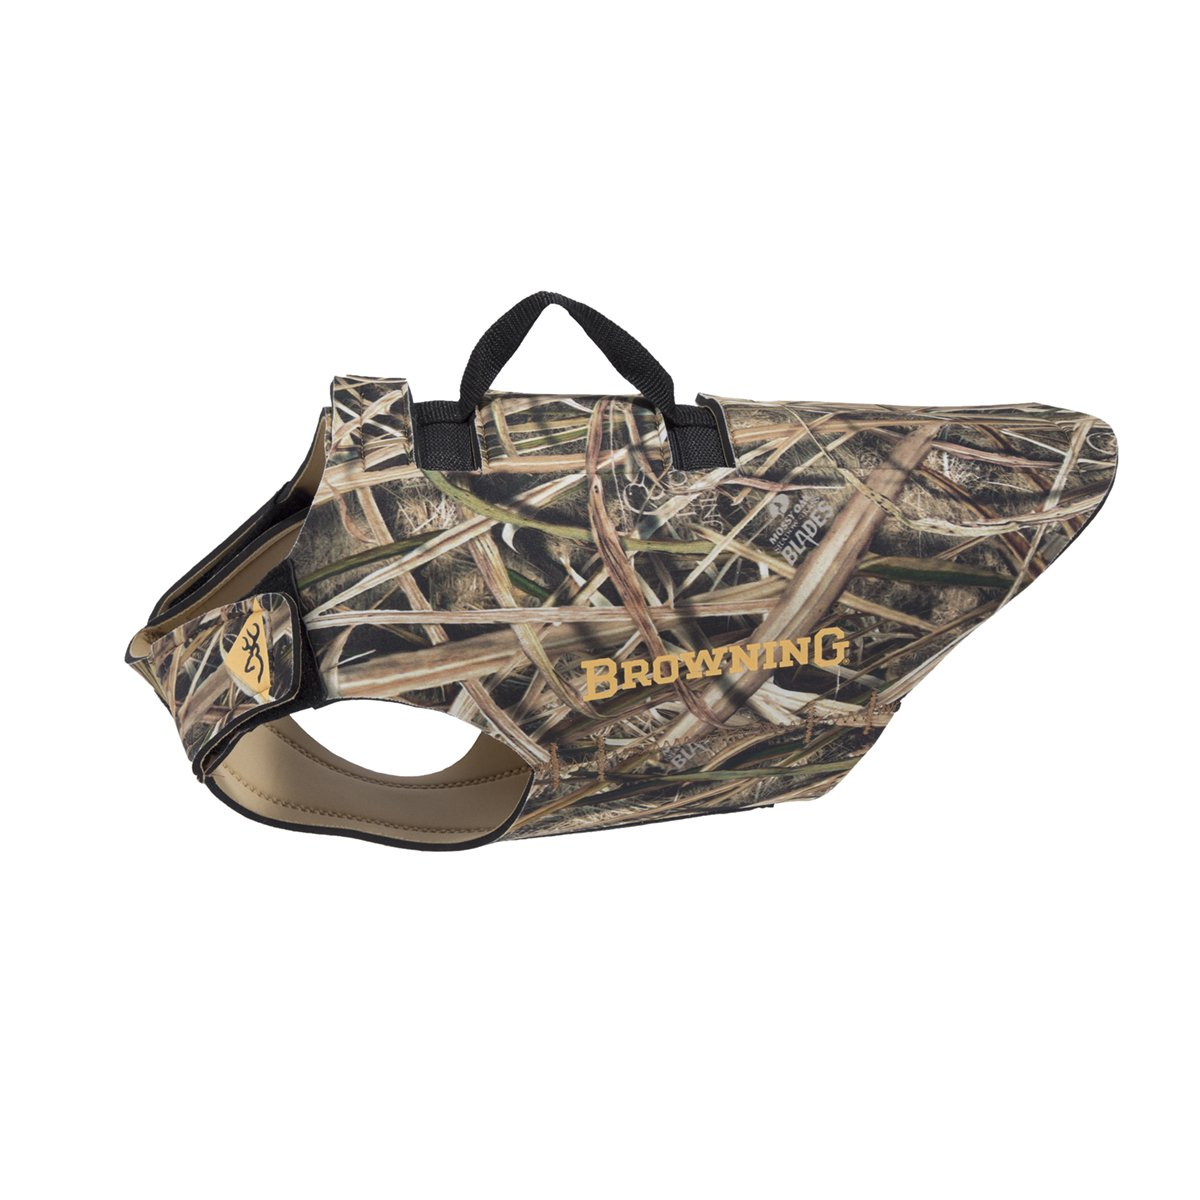 Browning 5mm Neoprene Dog Vest Dog Hunting Vest, 5mm Neoprene, Camo, Shadow Grass Blades, Small